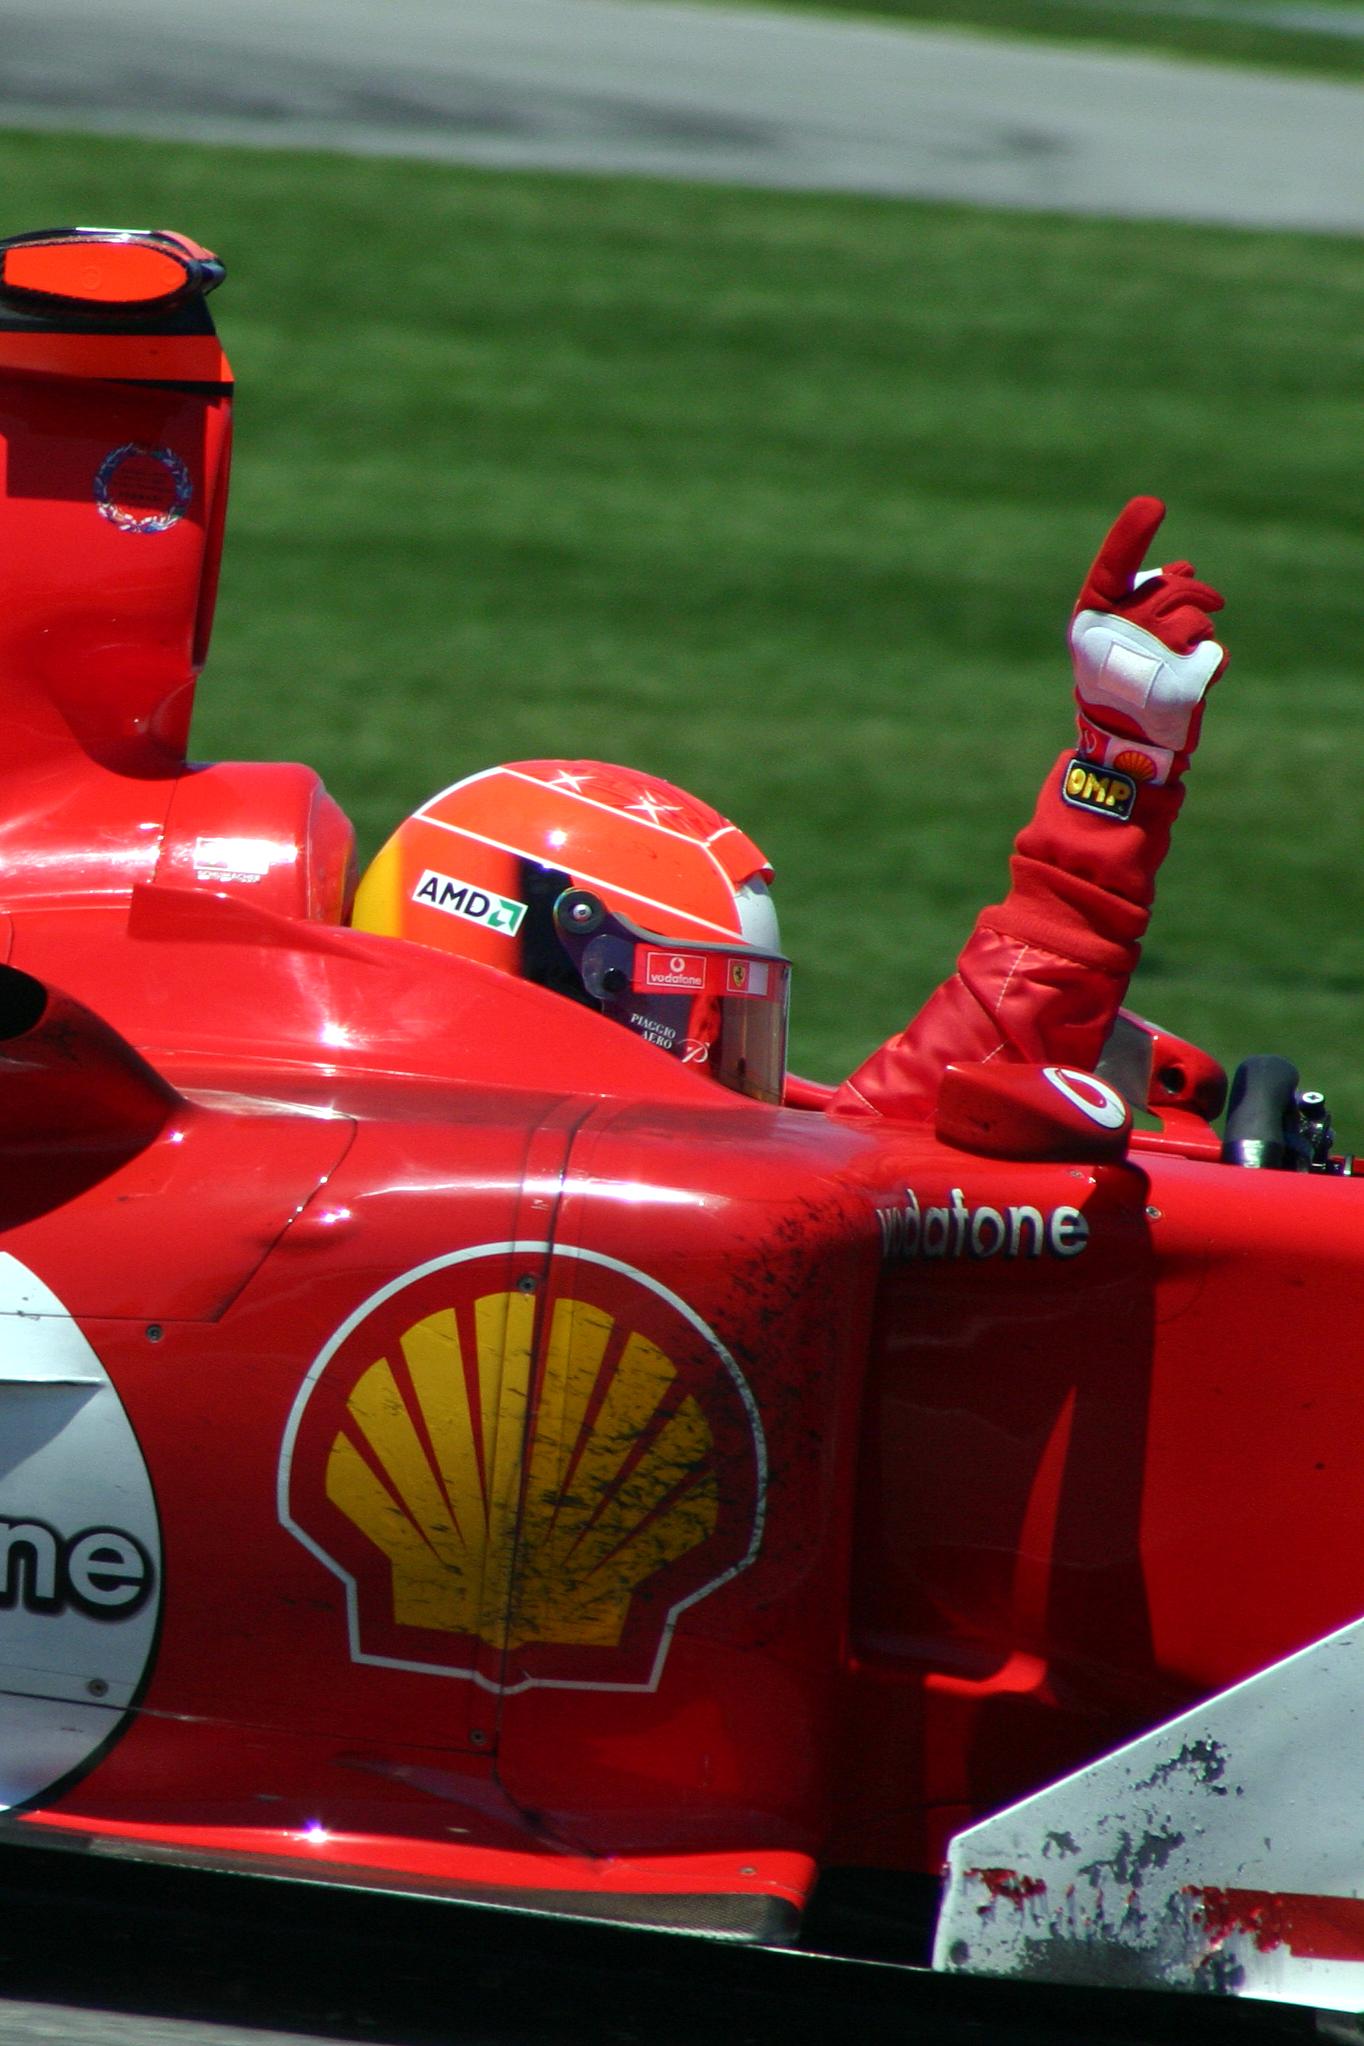 2007 United States Grand Prix